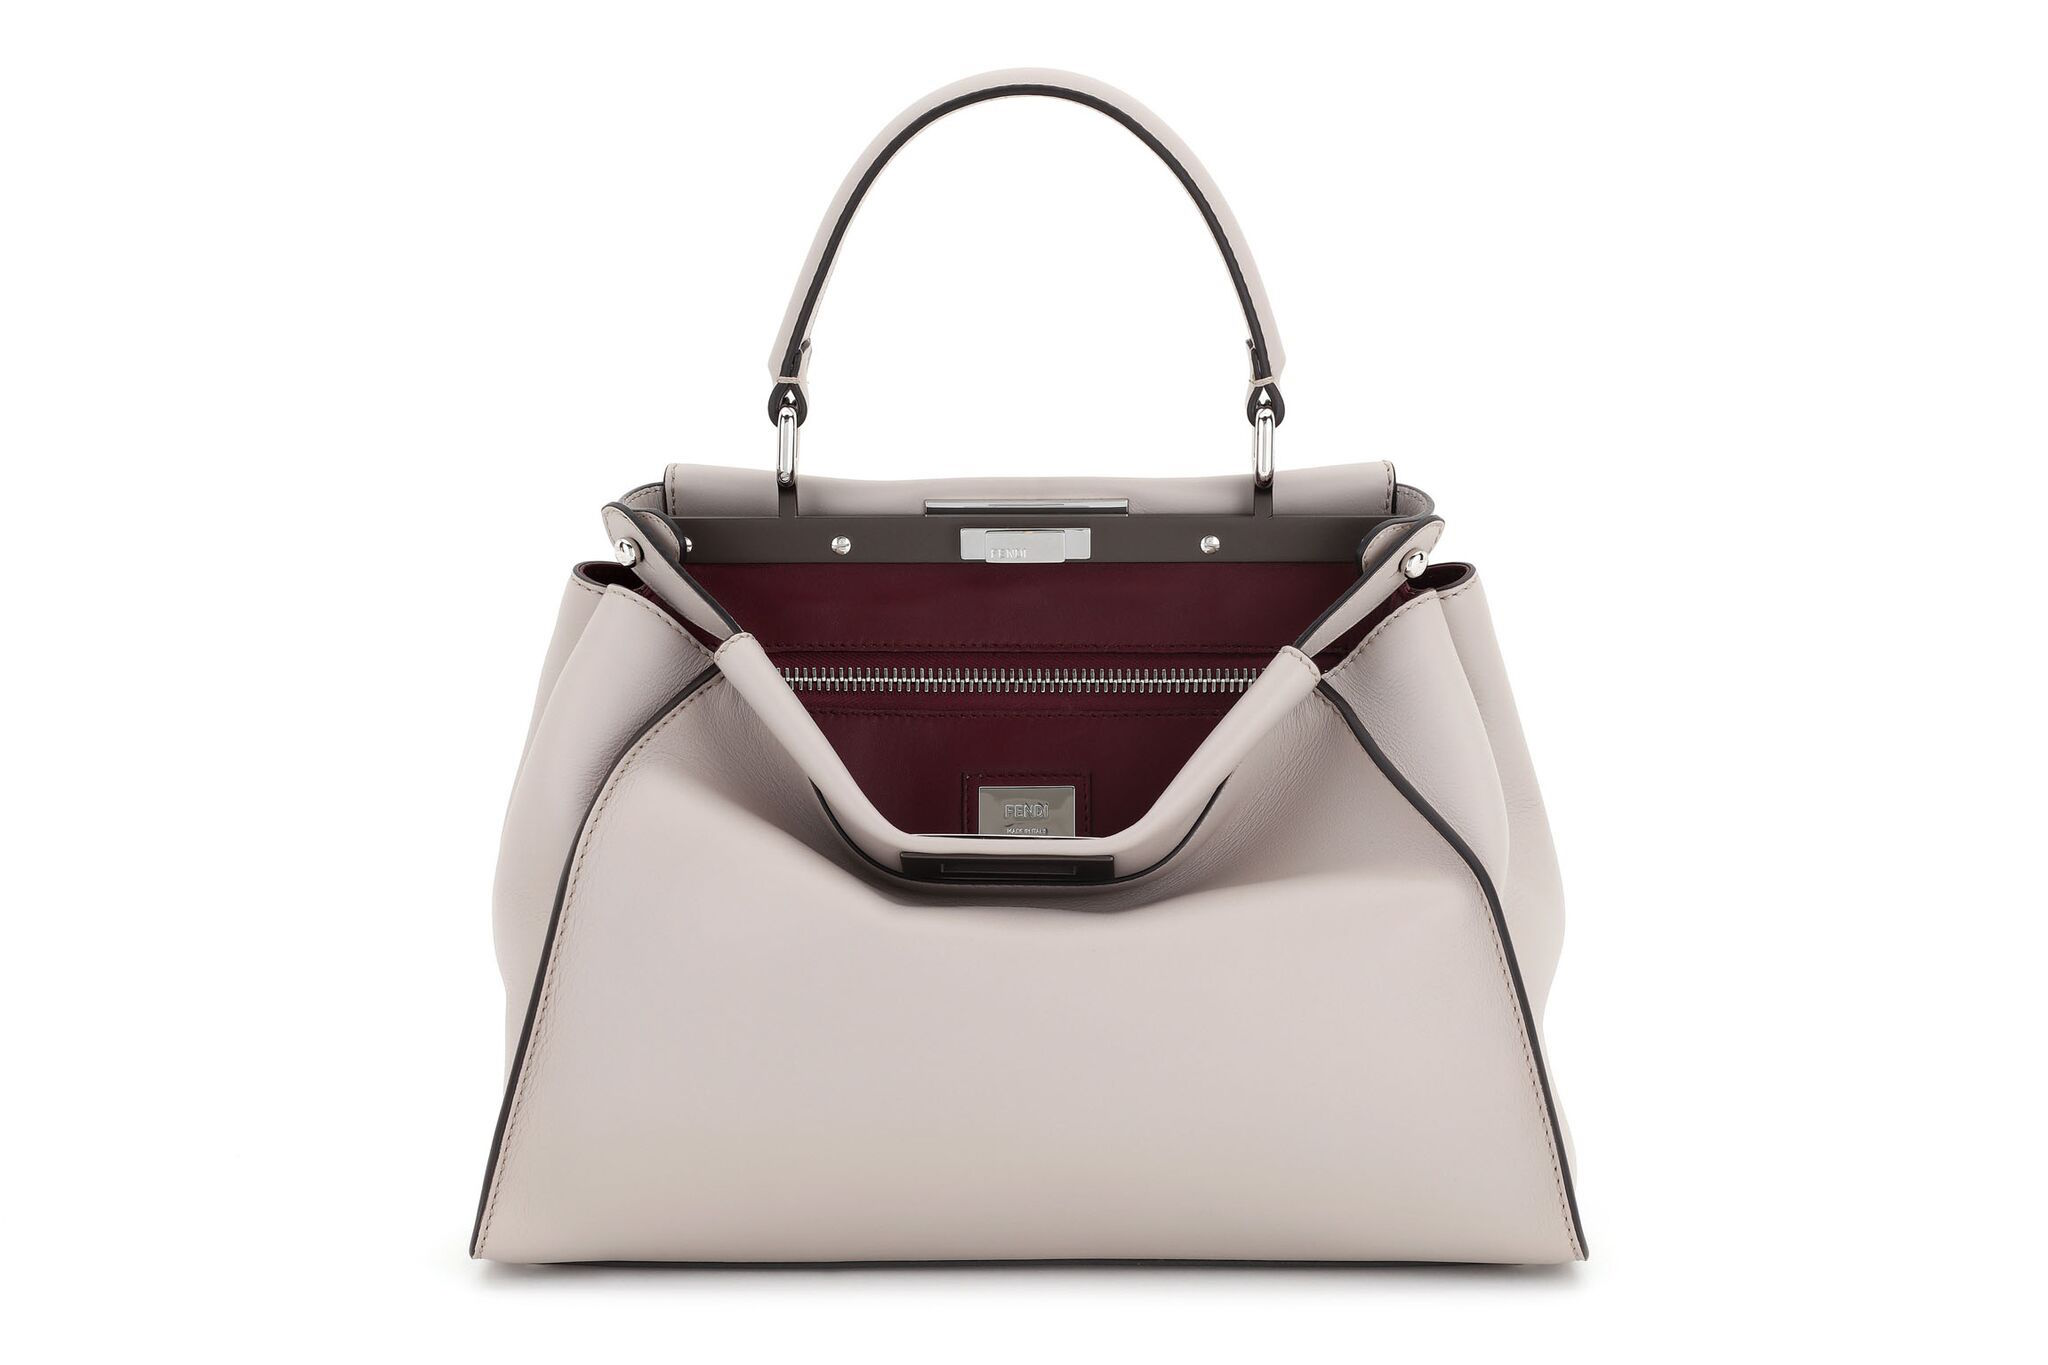 Fendi's regular Peekaboo purse in grey powder calf leather